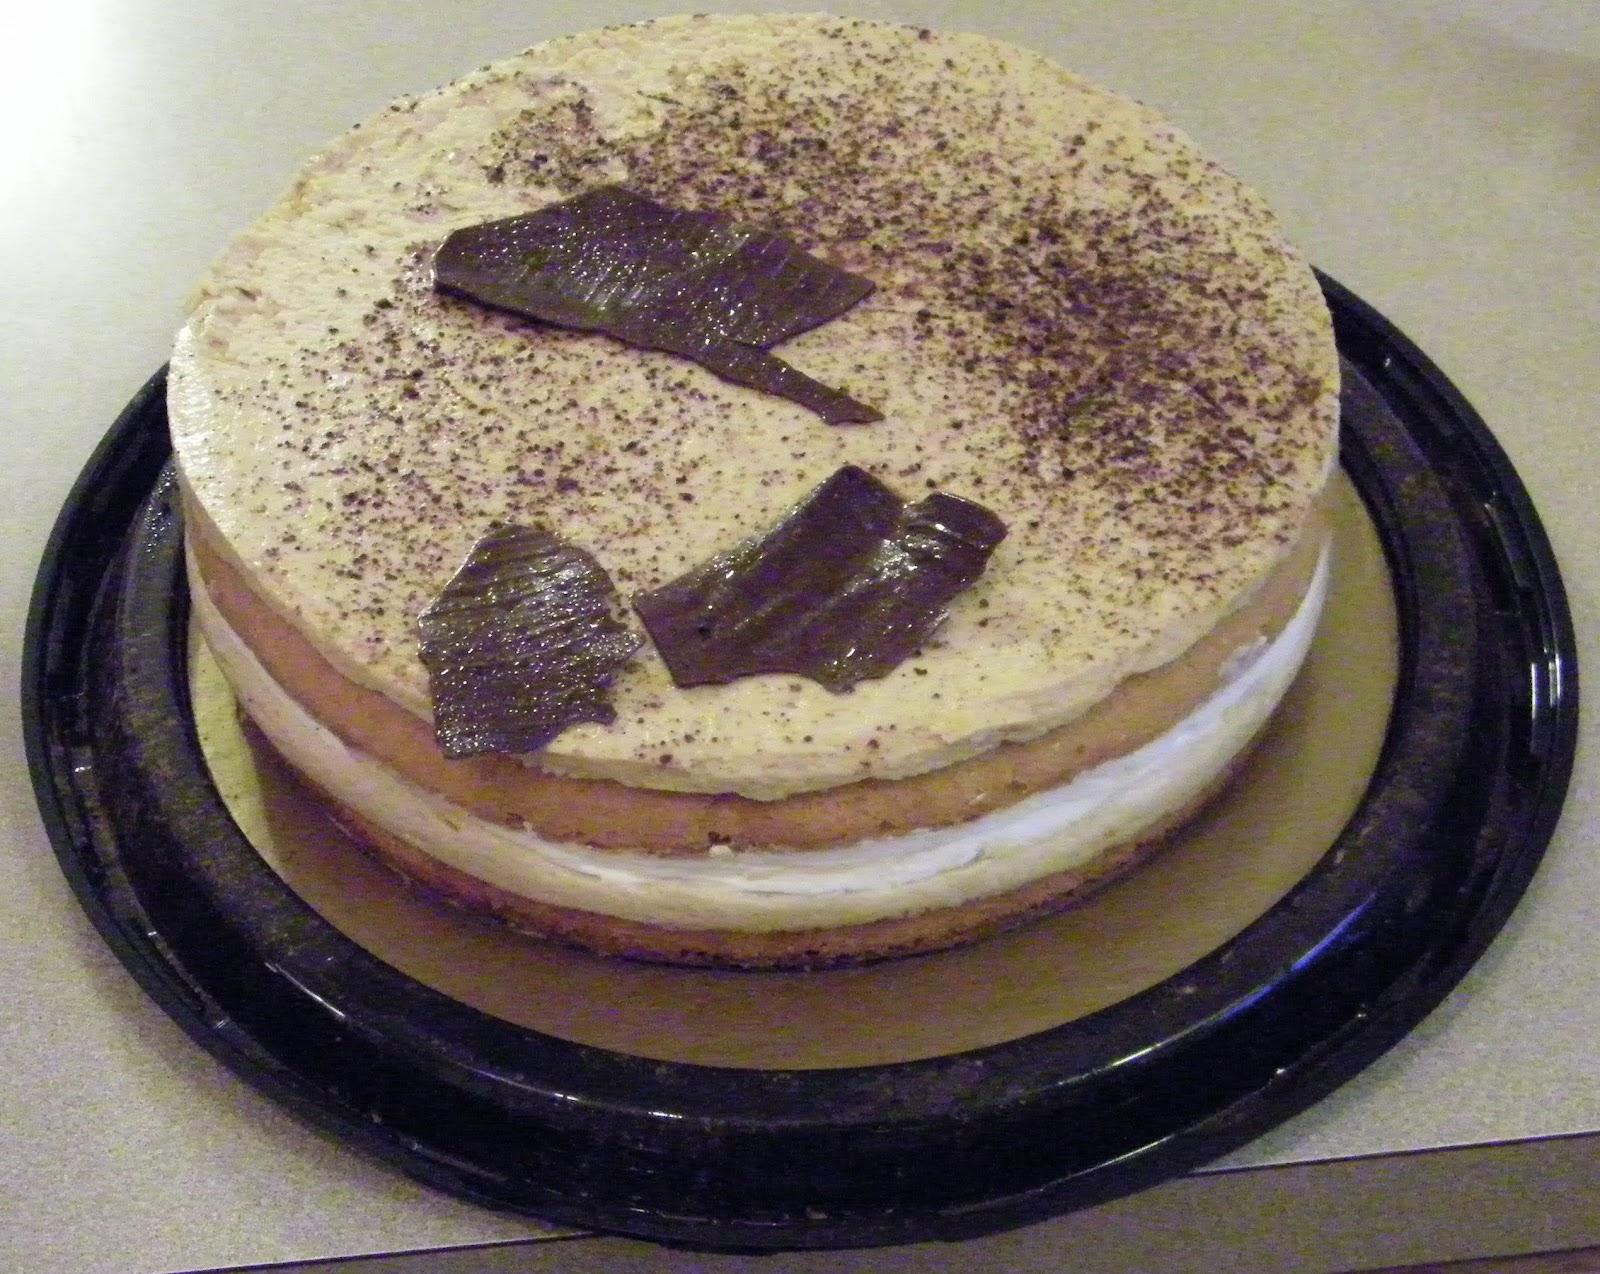 Costco Cuisine: Review of Tiramisu Cake On Sale This Month At Costco